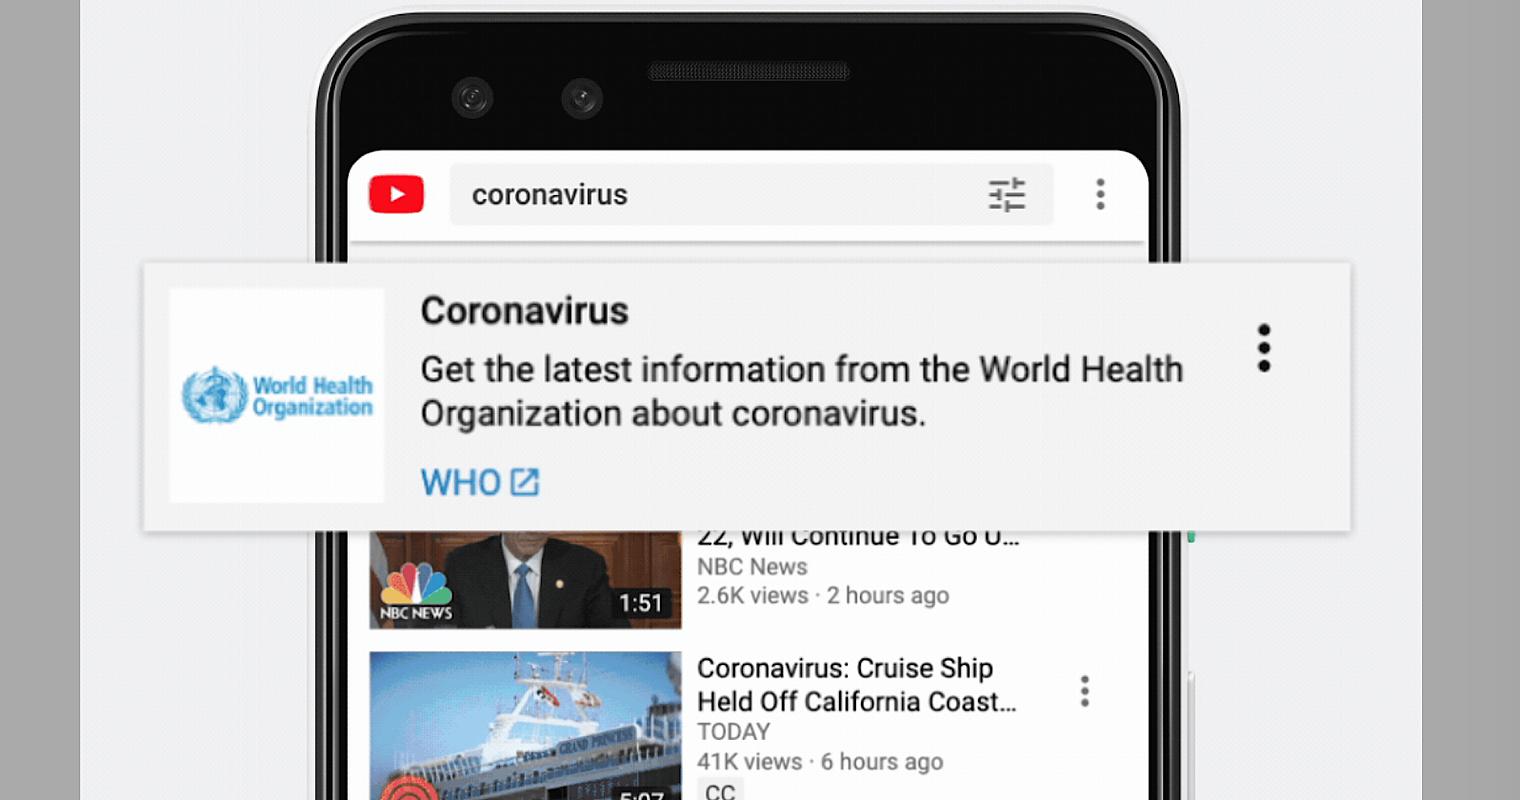 YouTube Allows Creators to Monetize Content About Coronavirus